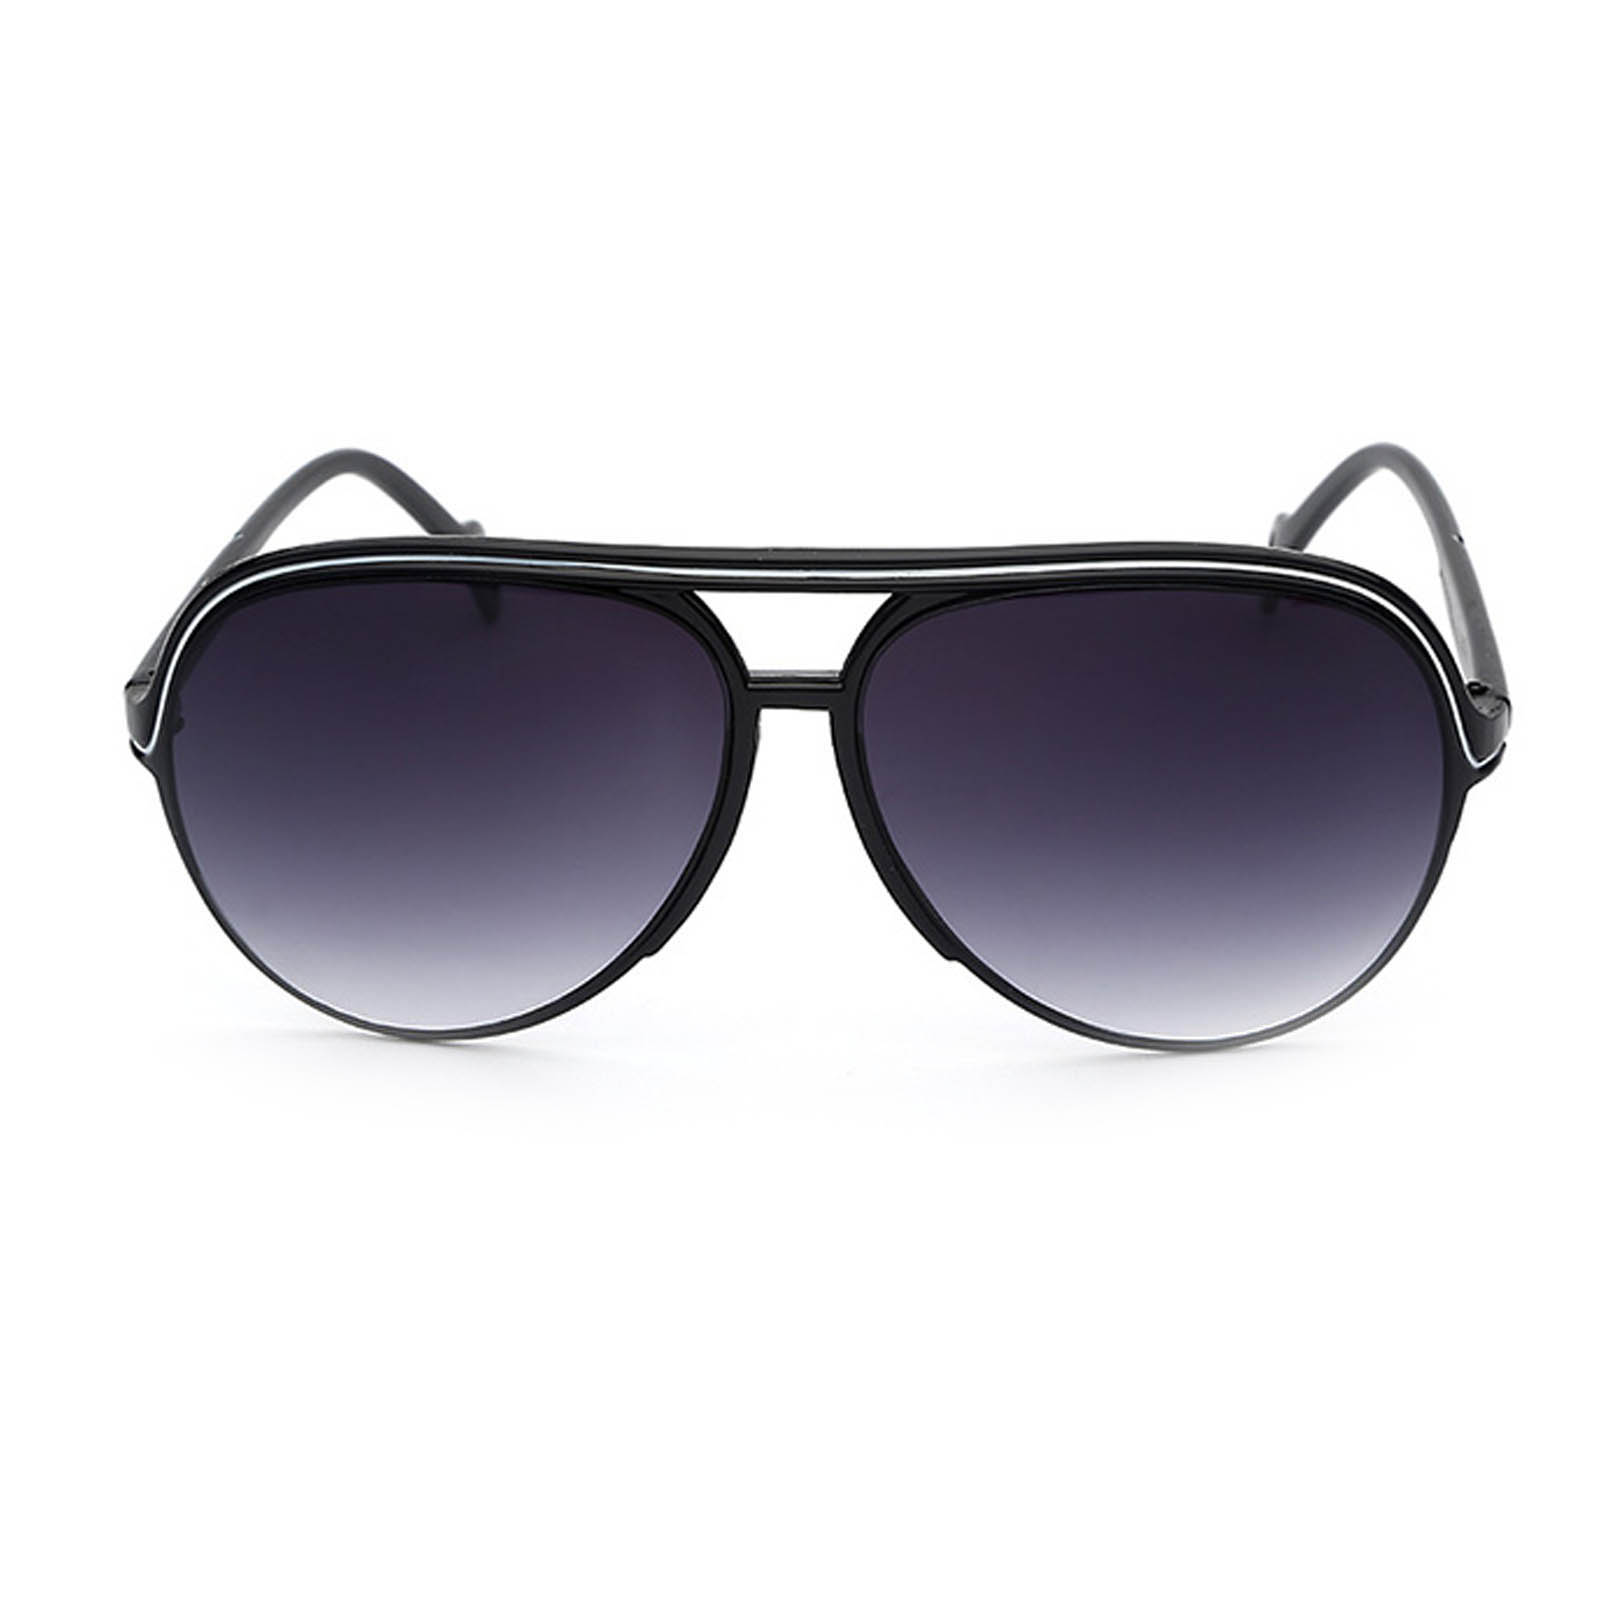 31a5b7da26b ... OWL ® 047 C1 Aviator Eyewear Sunglasses Women s Men s Plastic Black Frame  Smoke Lens One Pair